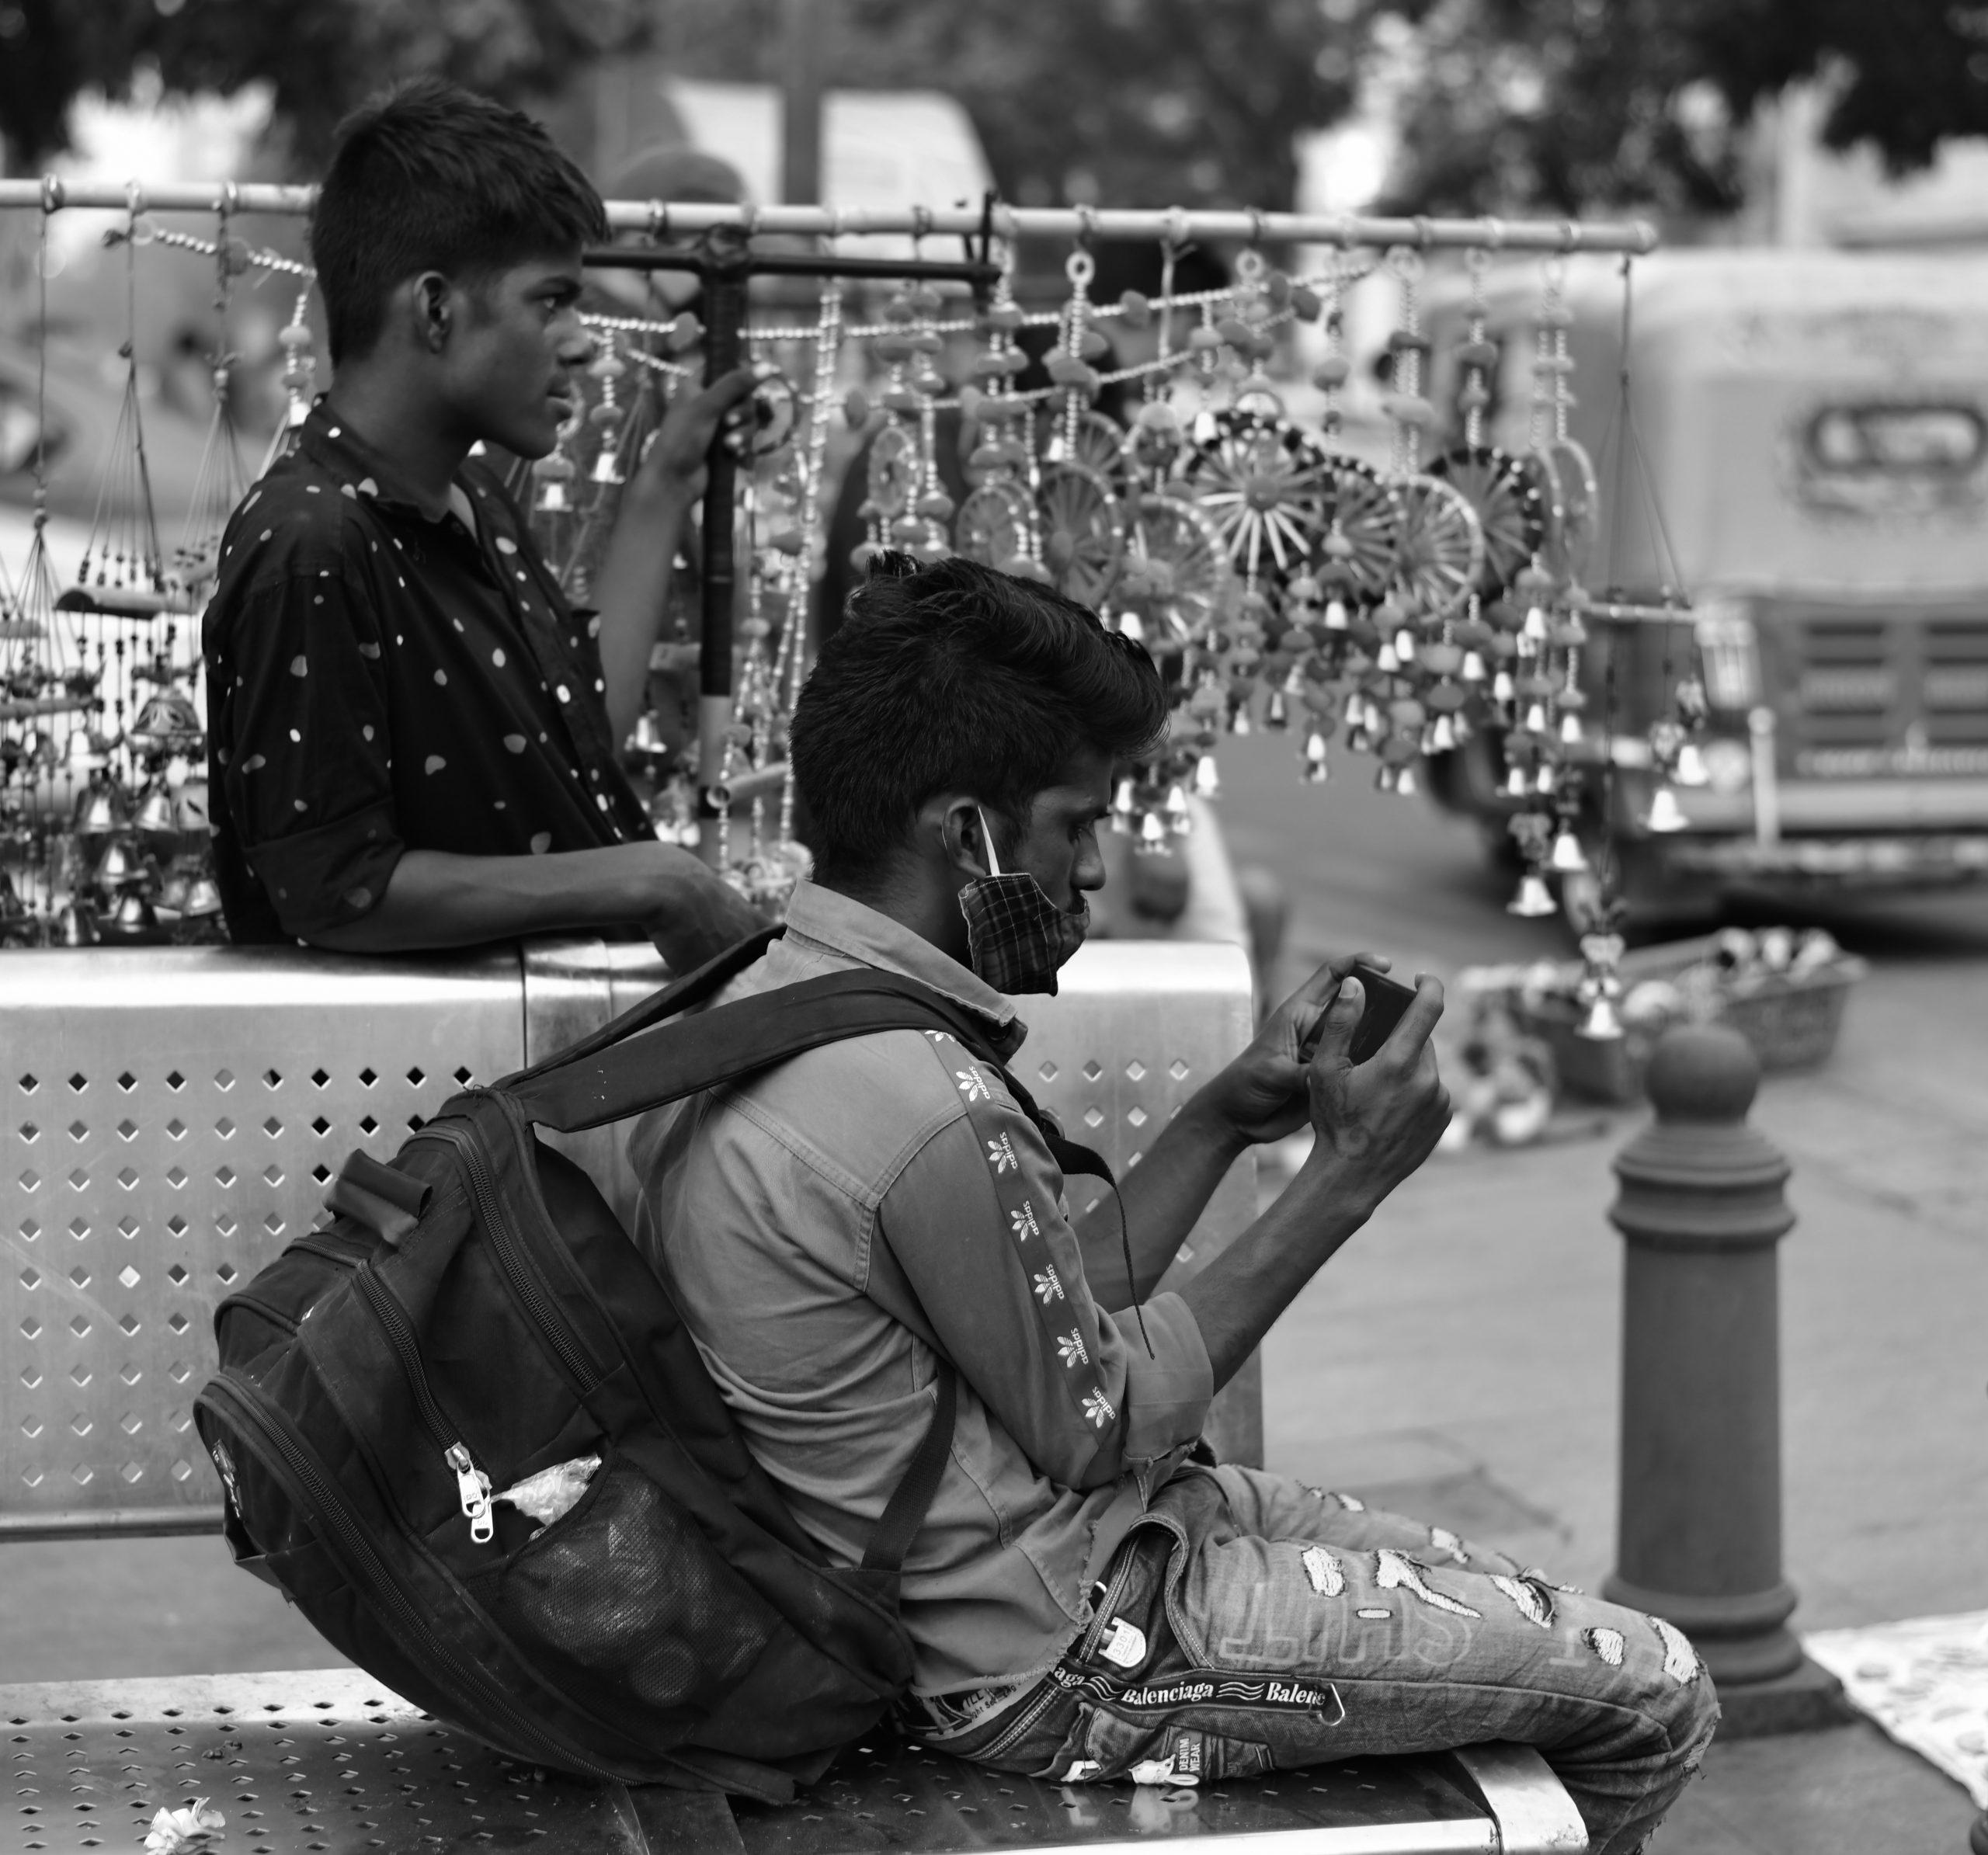 Street vendors selling decoration items